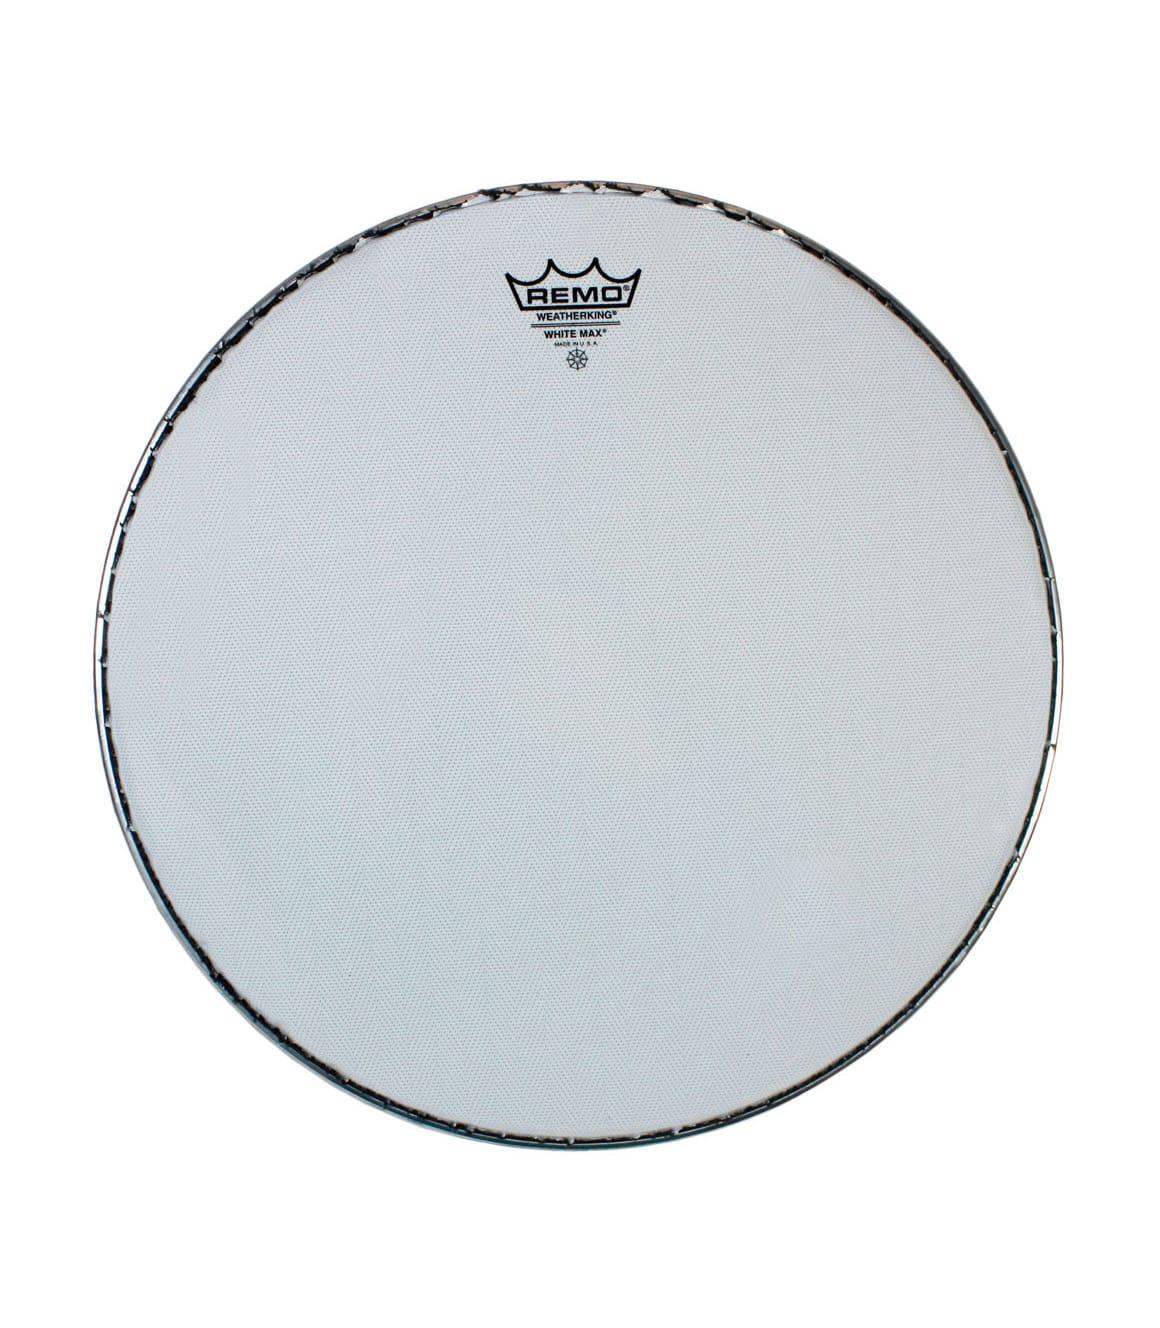 buy remo batter crimped white max 14 diameter